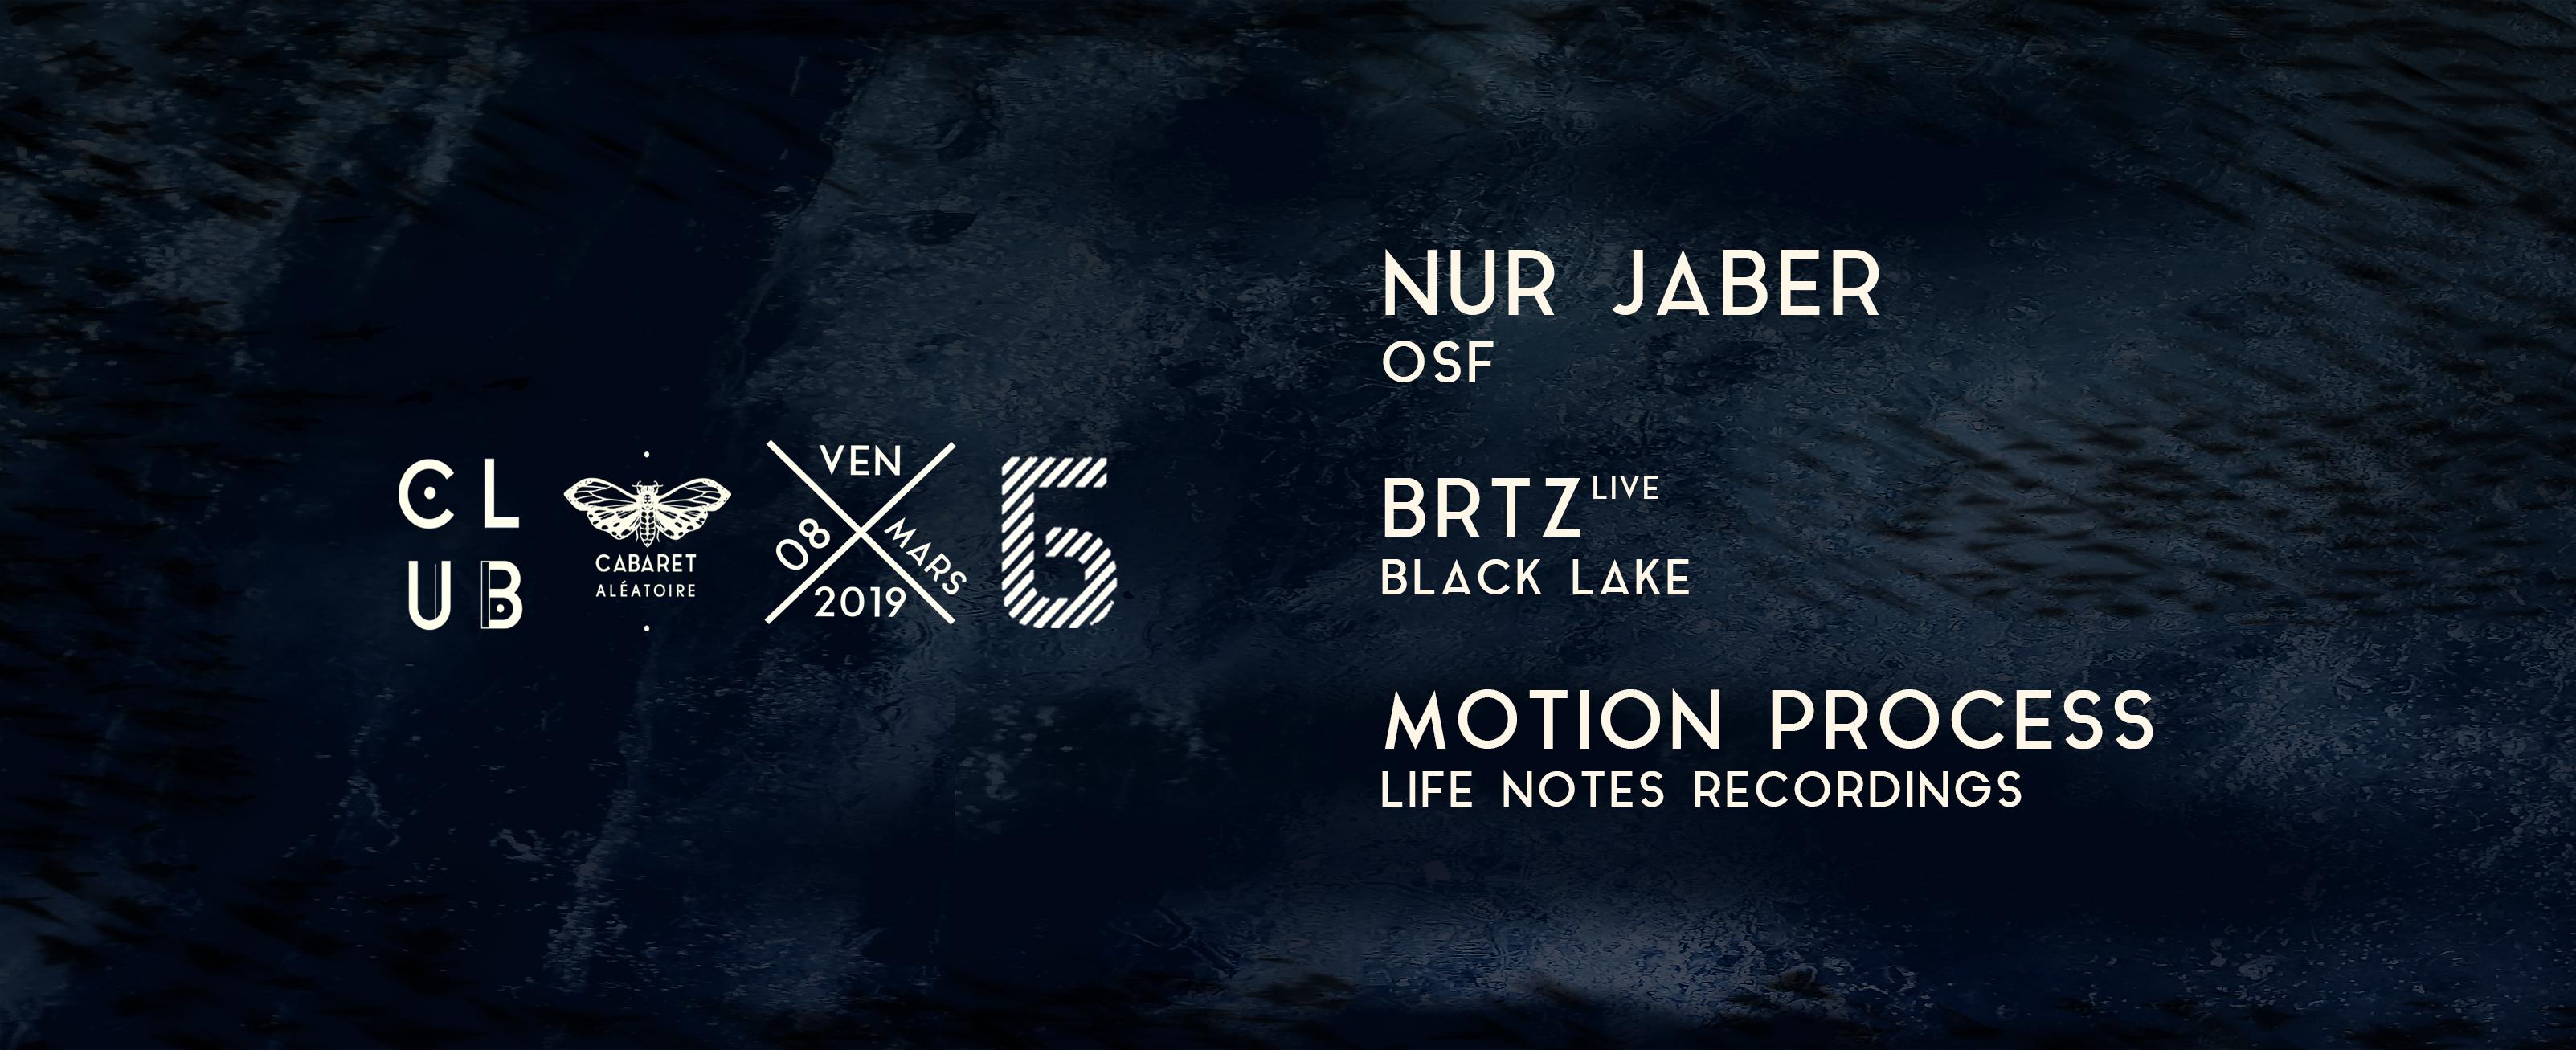 Club Cabaret x Bliss : Nur Jaber + BRTZ (live) + Motion Processs + ...